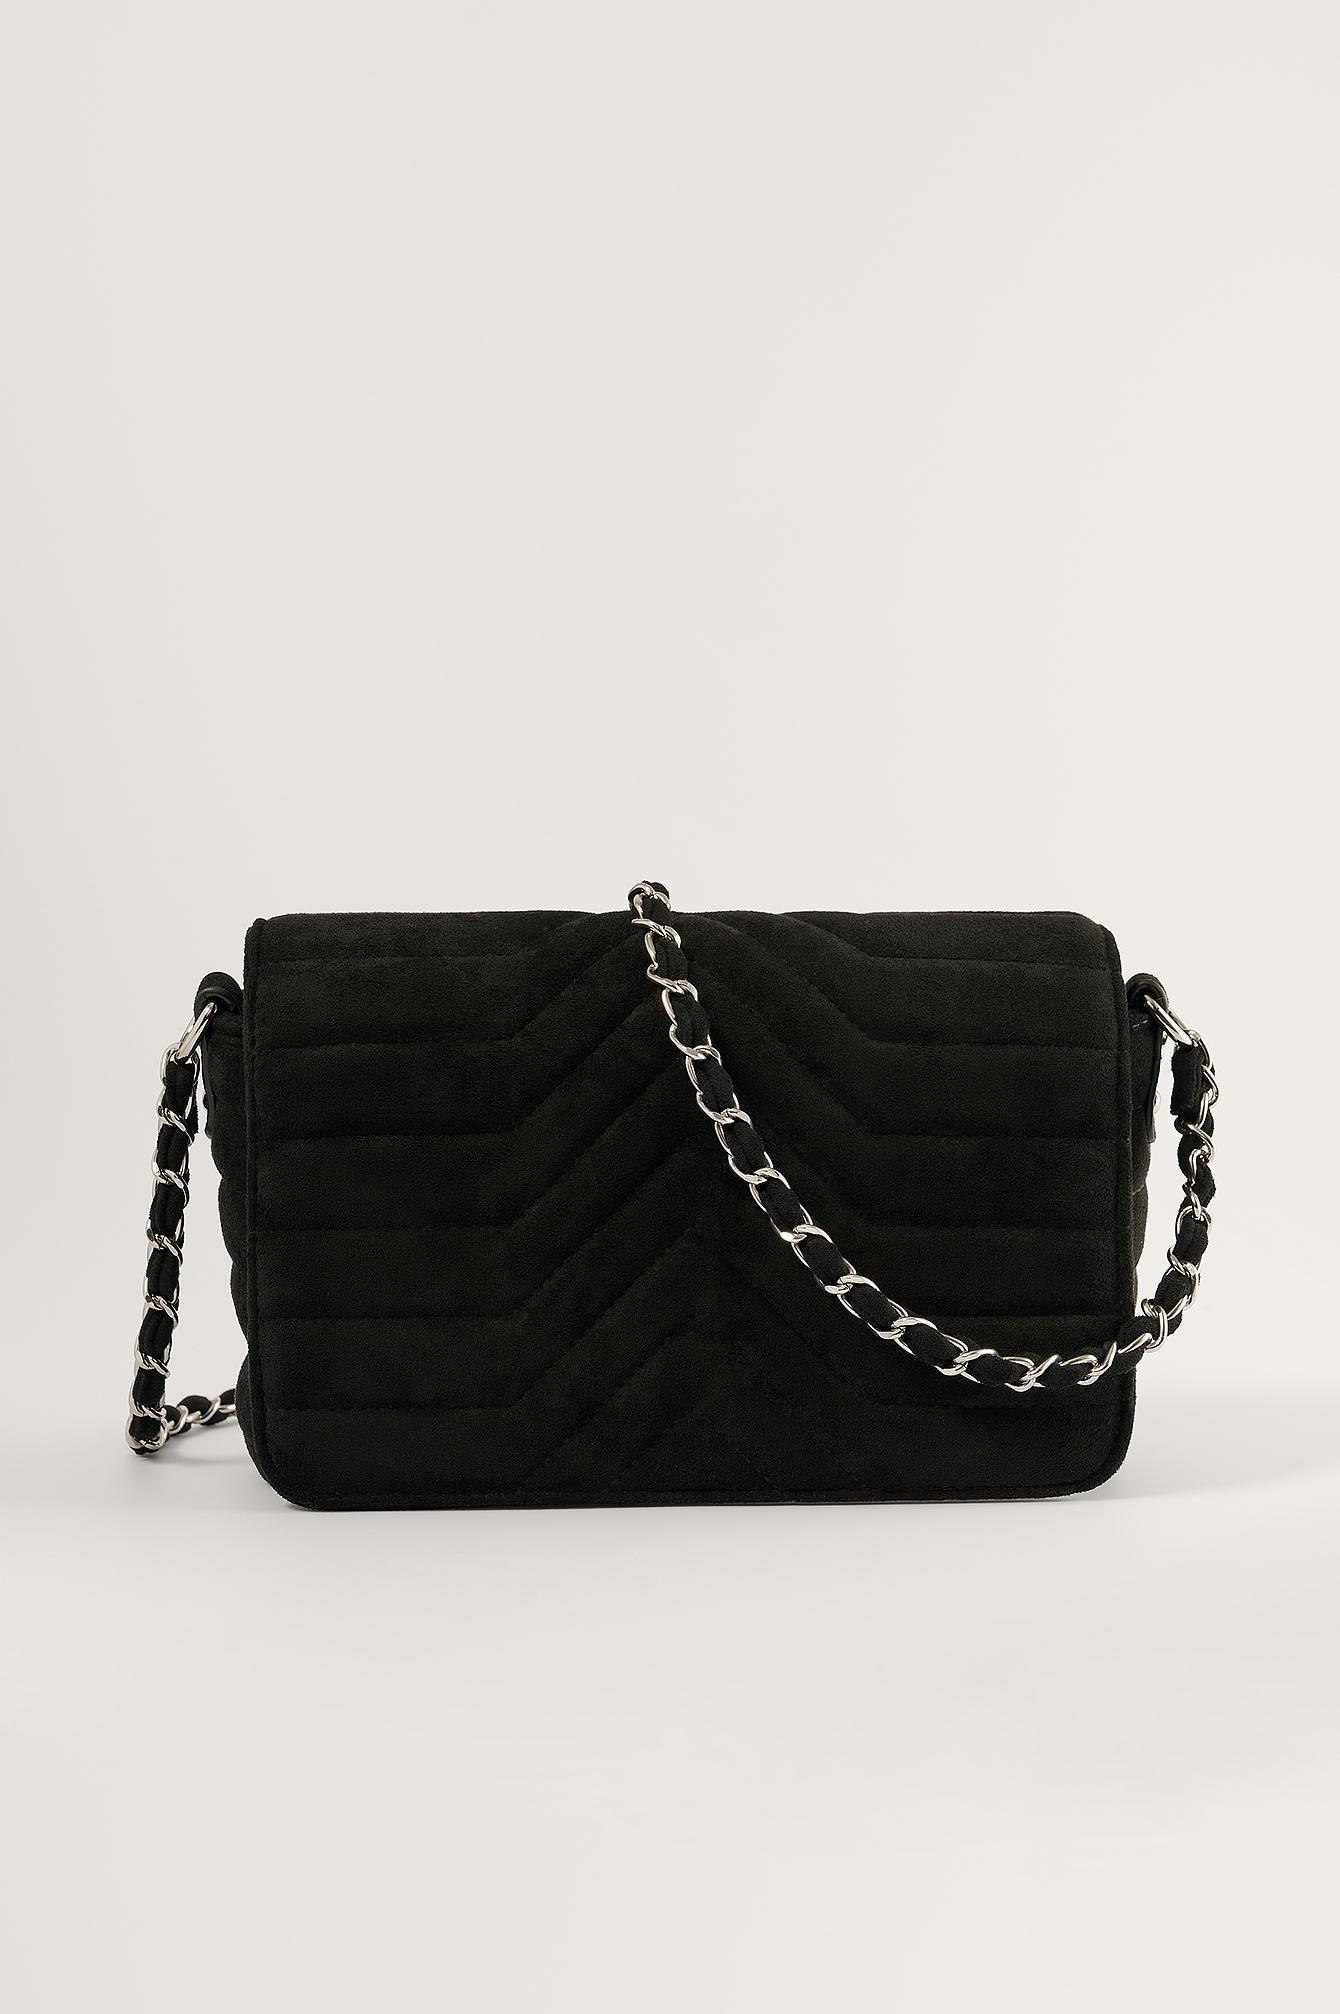 na-kd accessories -  Kette Crossbody-Tasche - Black